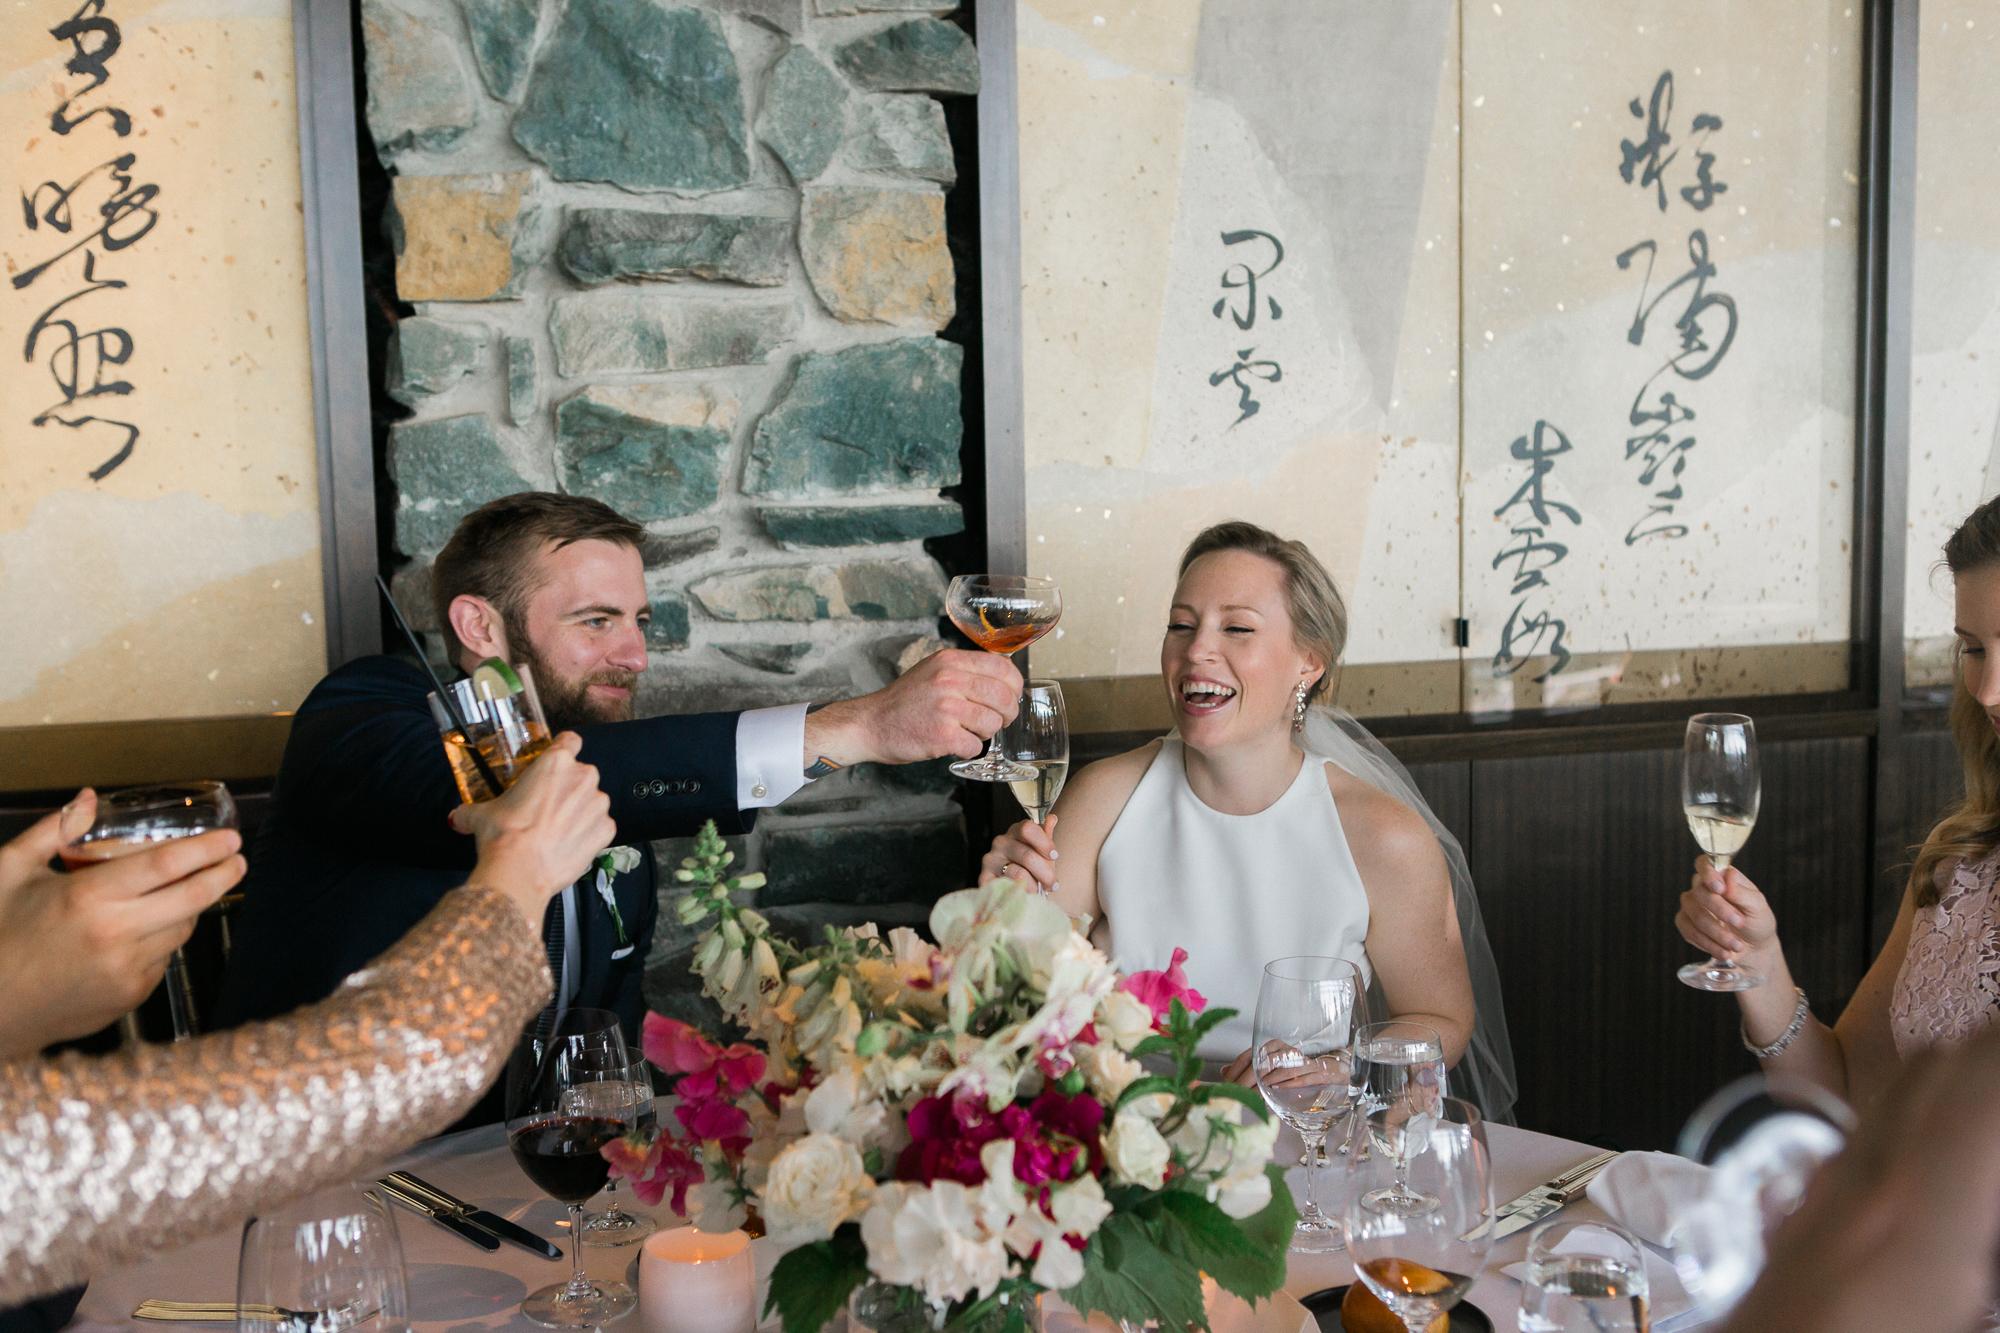 canlis restaurant wedding photos by Krista Welch-0093.jpg